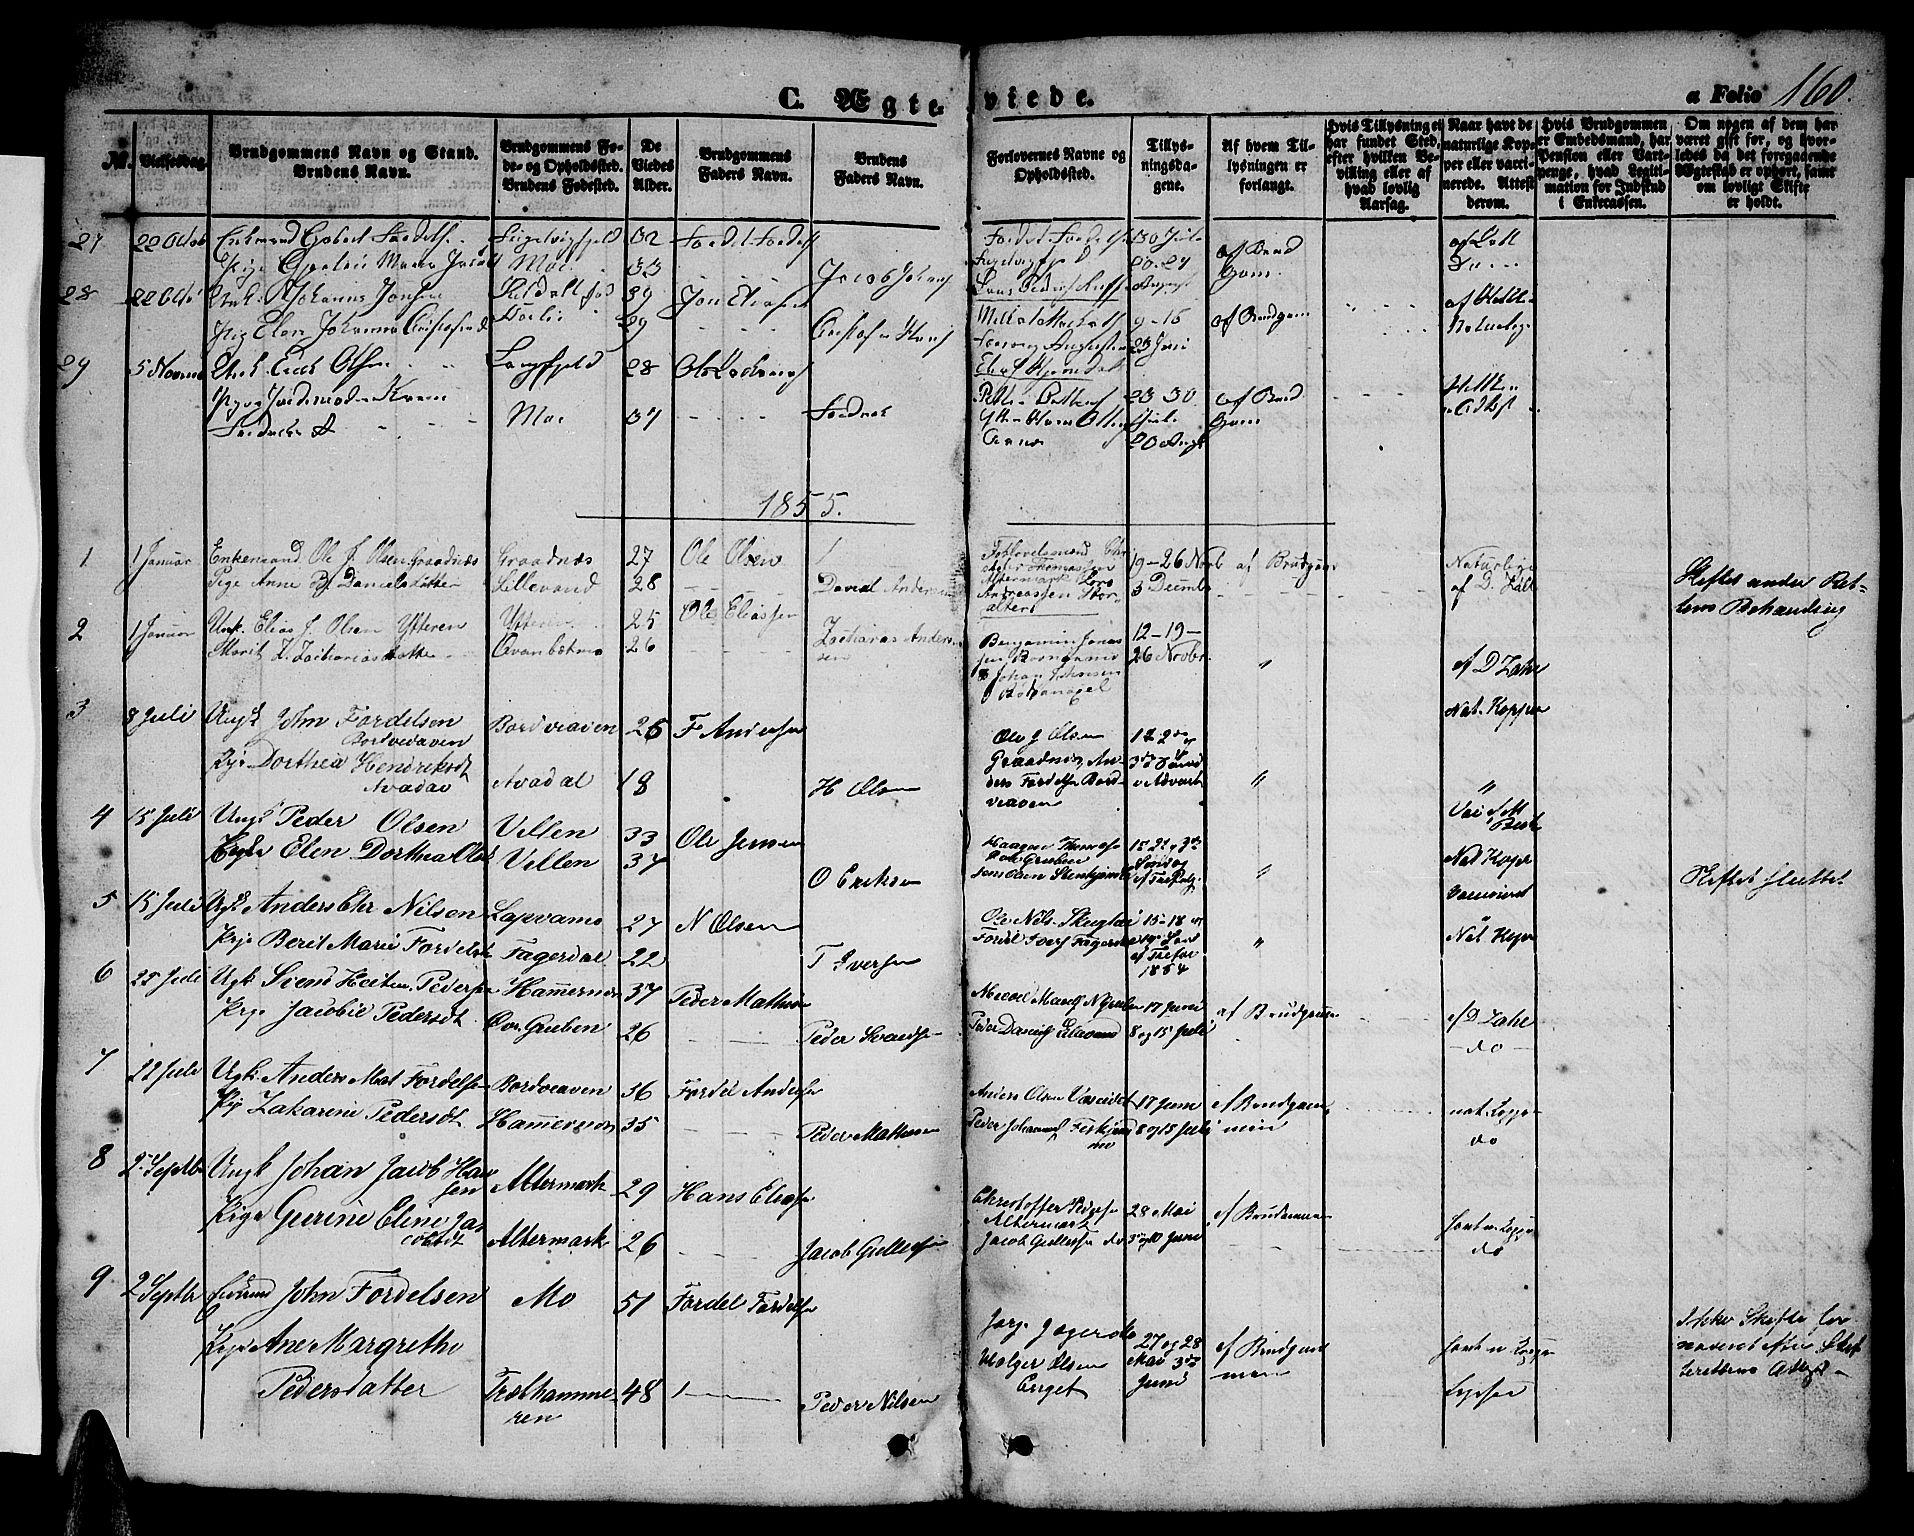 SAT, Ministerialprotokoller, klokkerbøker og fødselsregistre - Nordland, 827/L0414: Klokkerbok nr. 827C03, 1853-1865, s. 160